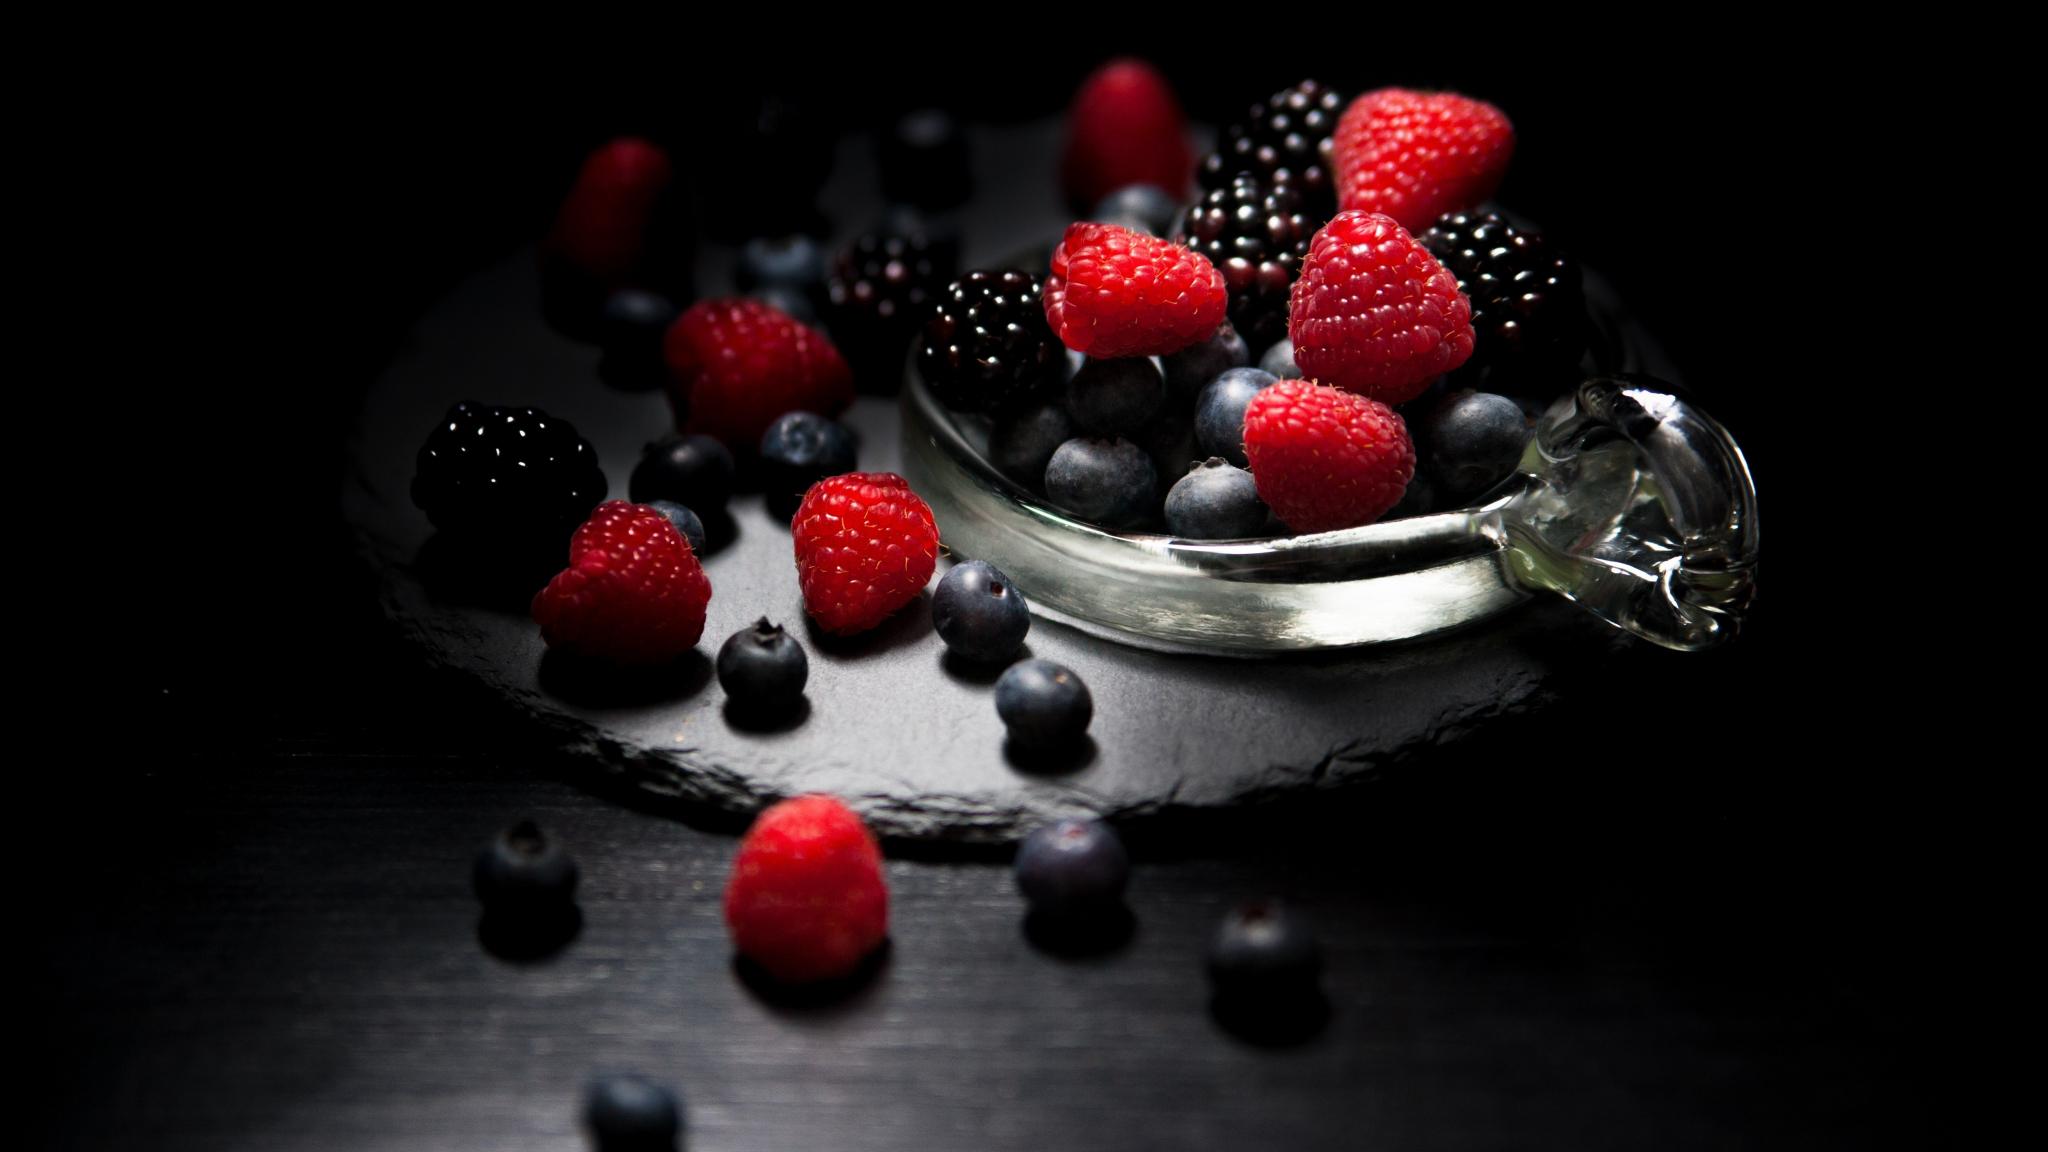 2048x1152 wallpaper Dark mood, food, fruits, blueberry, raspberry, blackberry, 4k